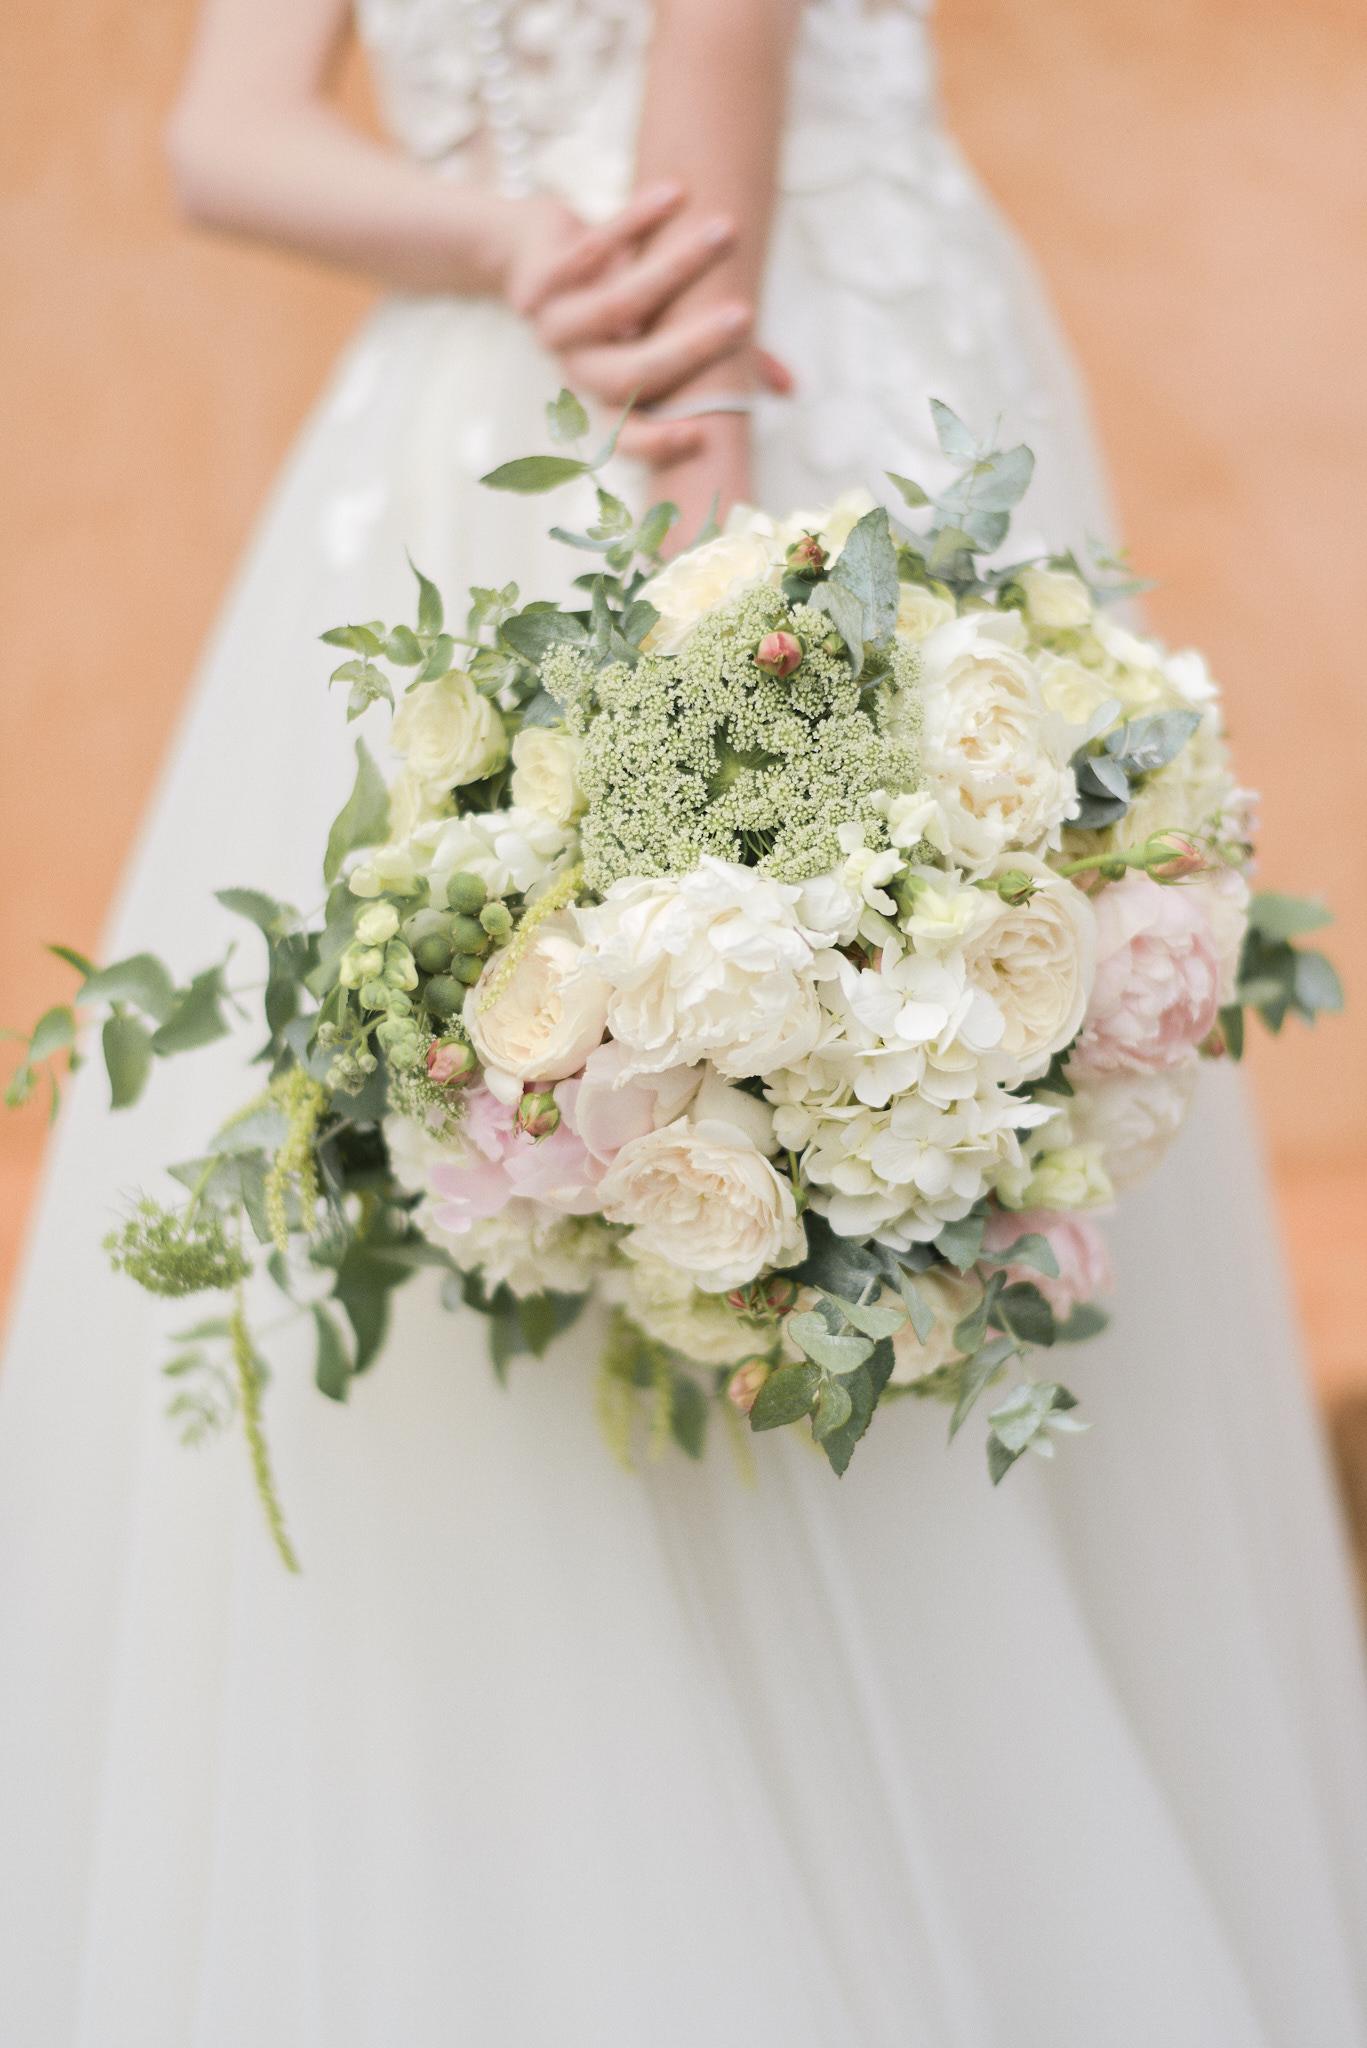 Sephory Photography - Romance is not dead 049 - Web.jpg